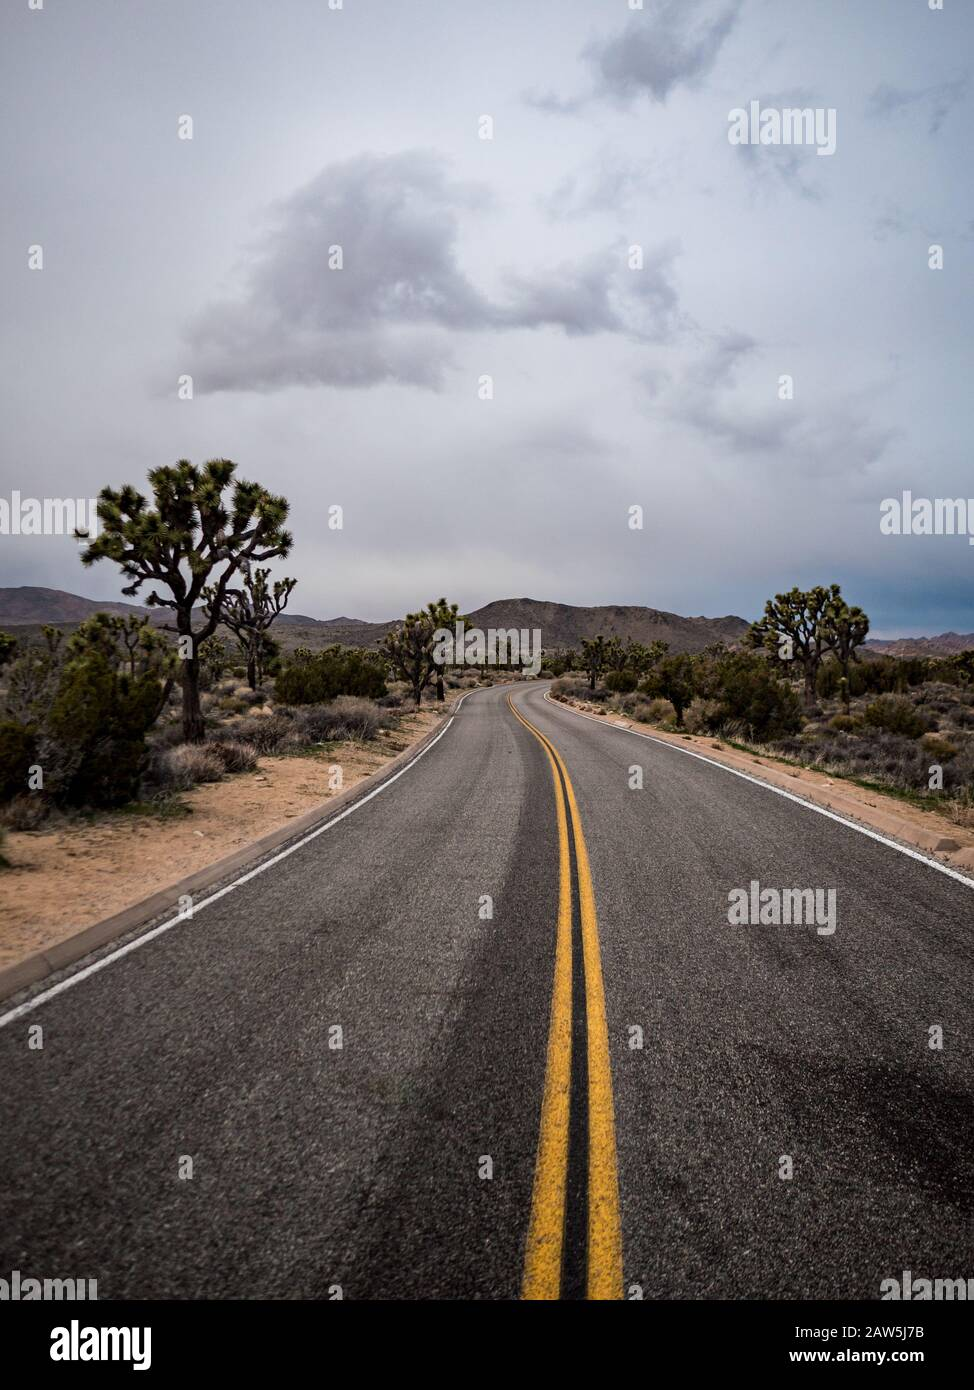 Road winding through Joshua Tree National Park under gray skies Stock Photo